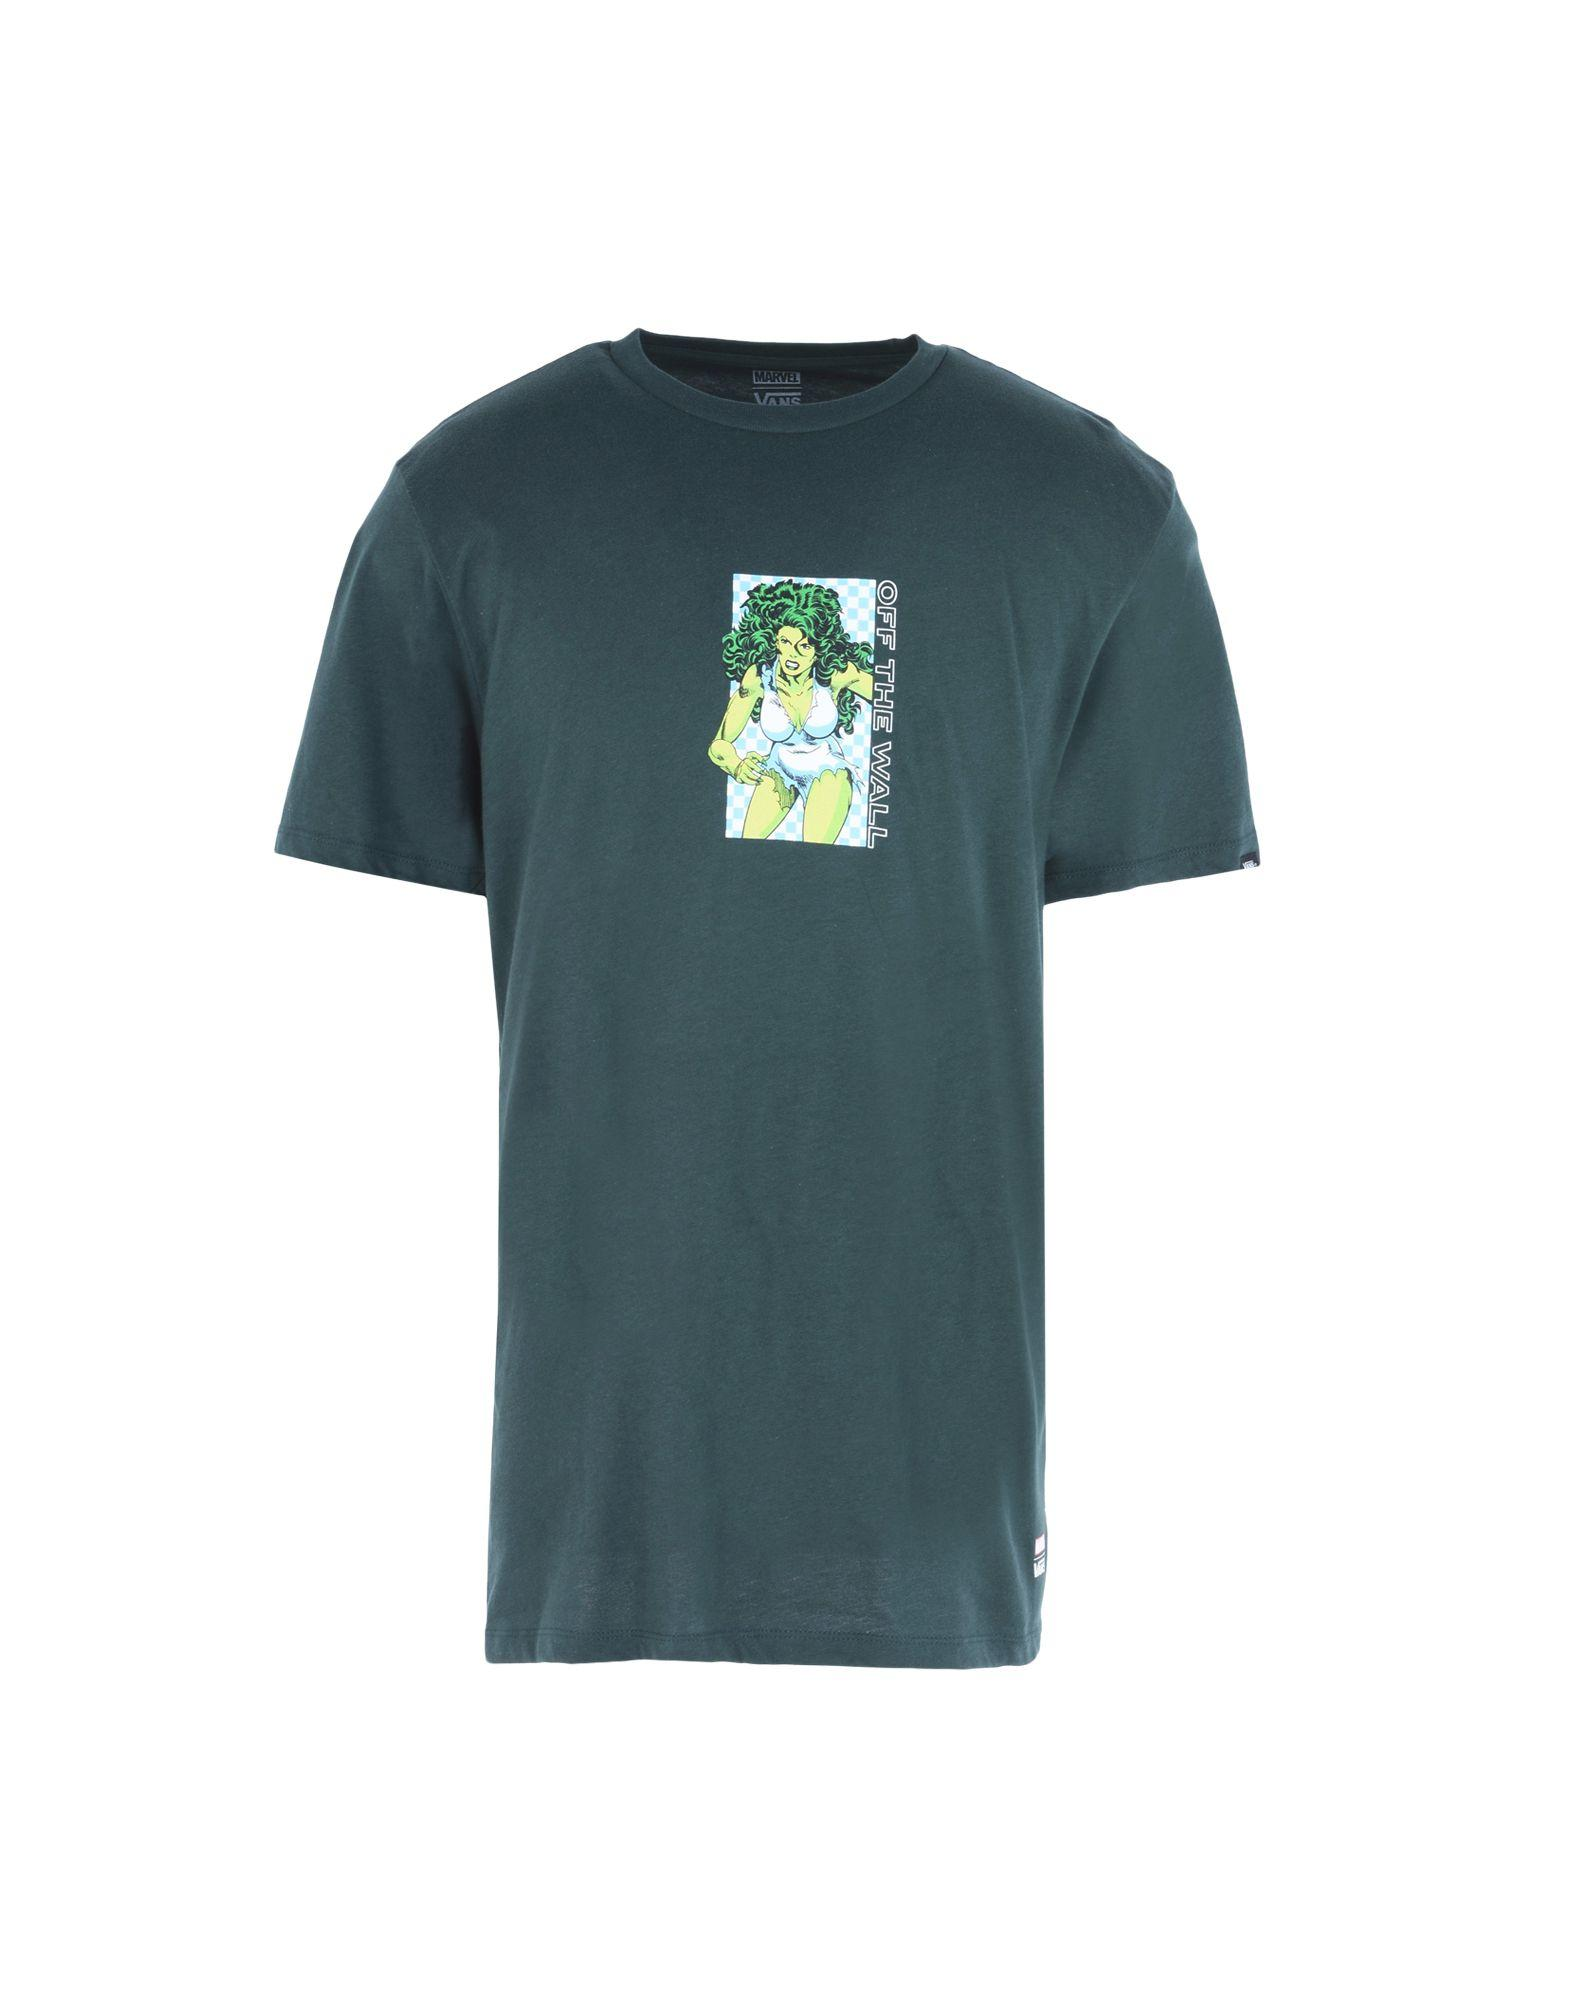 e4c376acc6 Vans T-Shirts In Dark Green